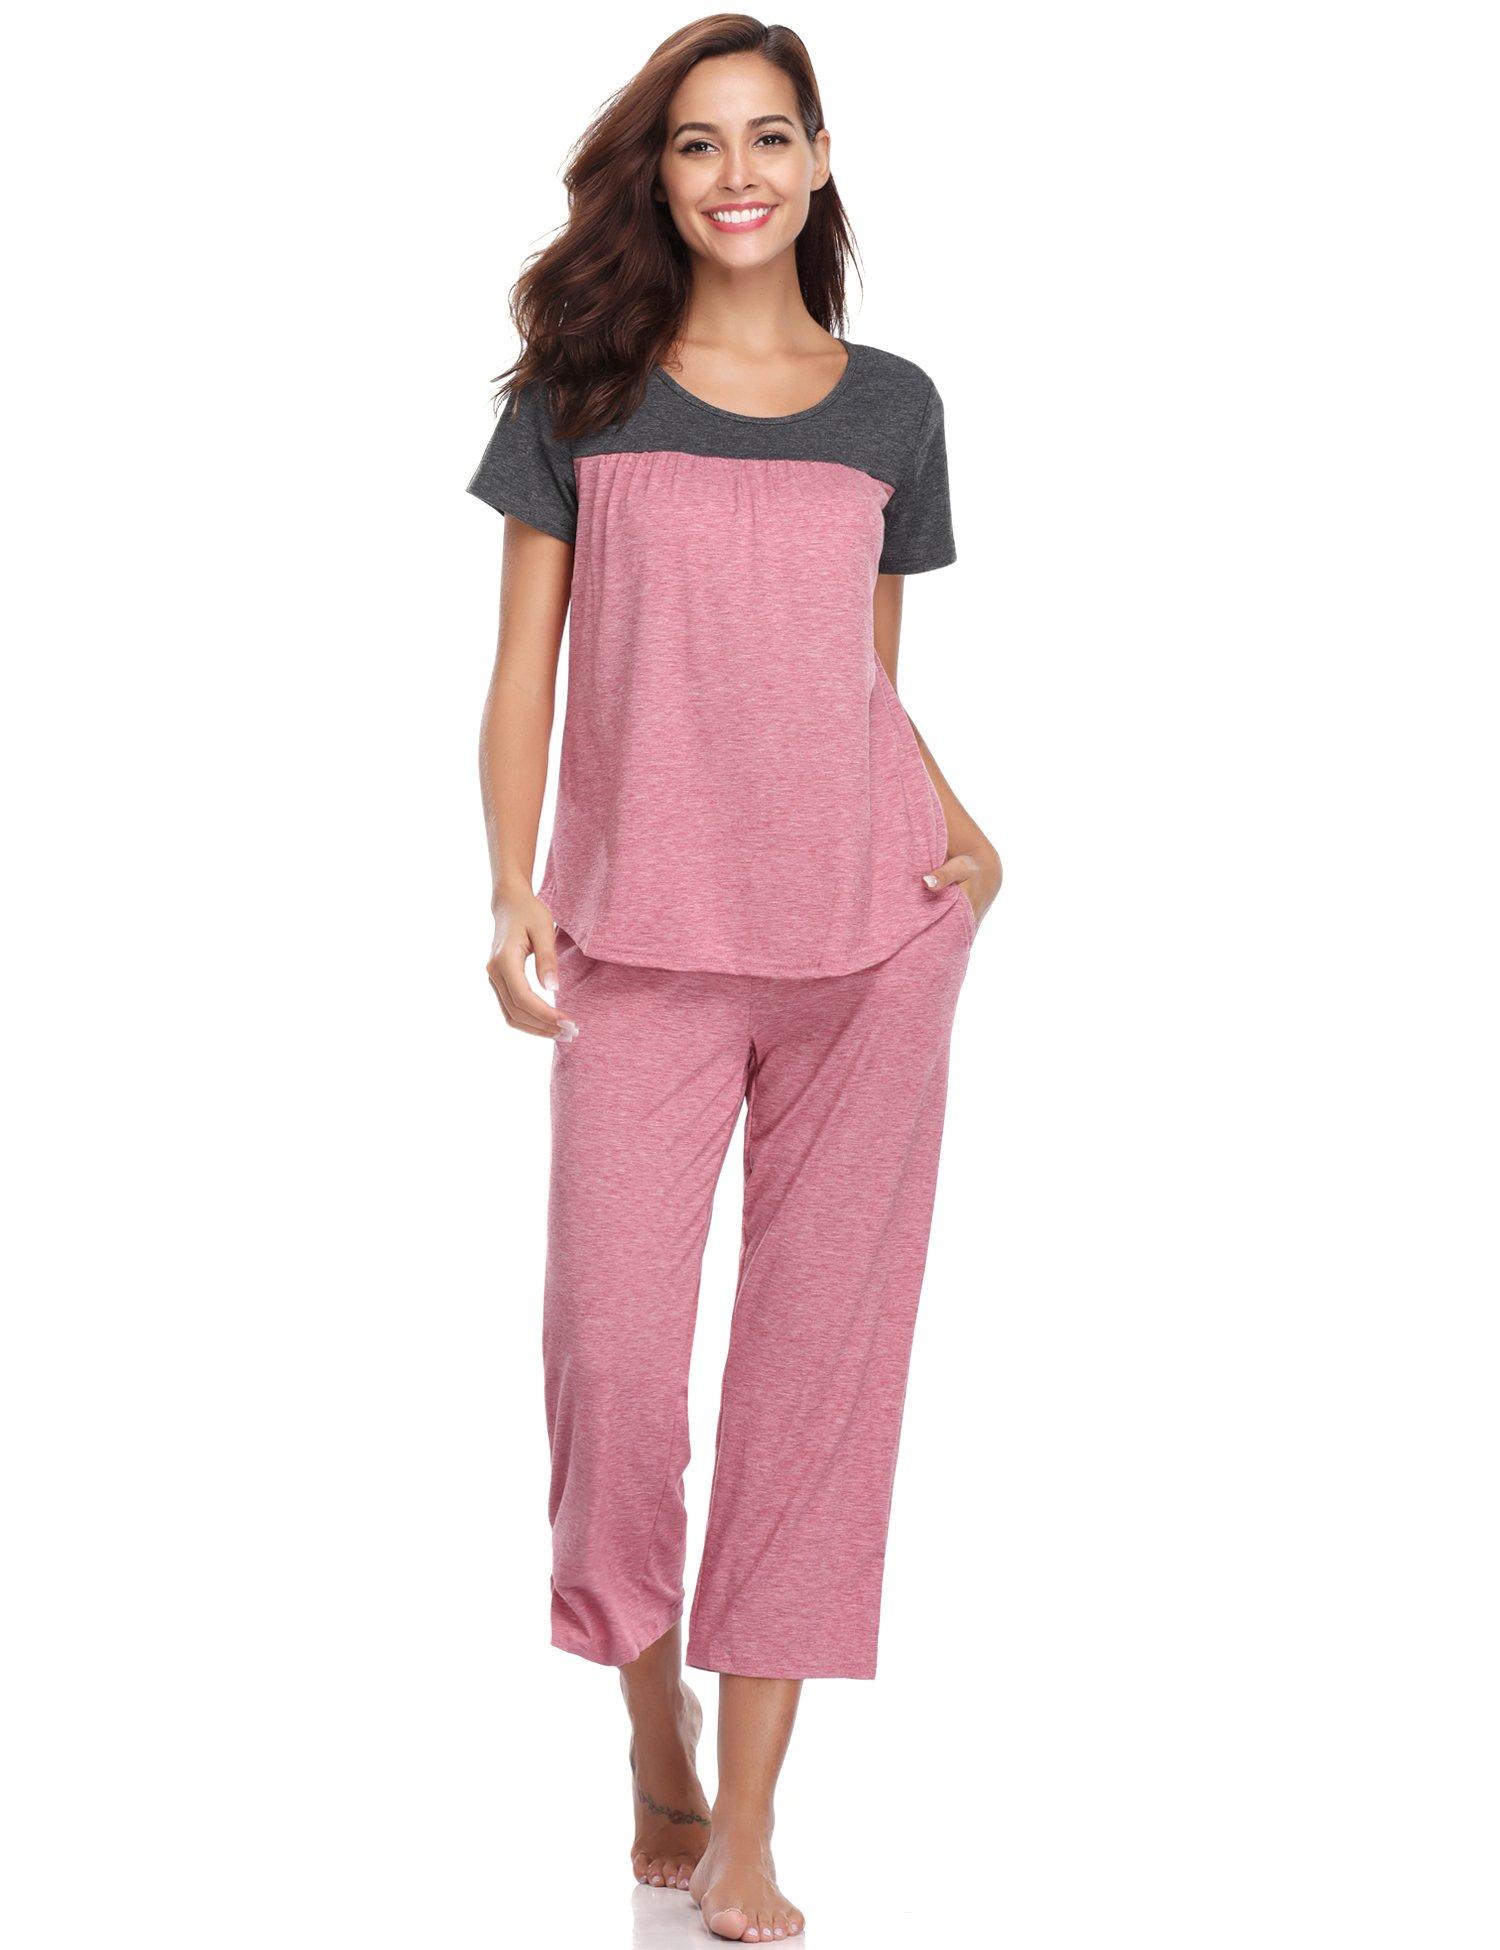 Aibrou Women's Sleepwear Cotton Short Sleeve Pleated Stitching Top and Capri Pant Pajama Set